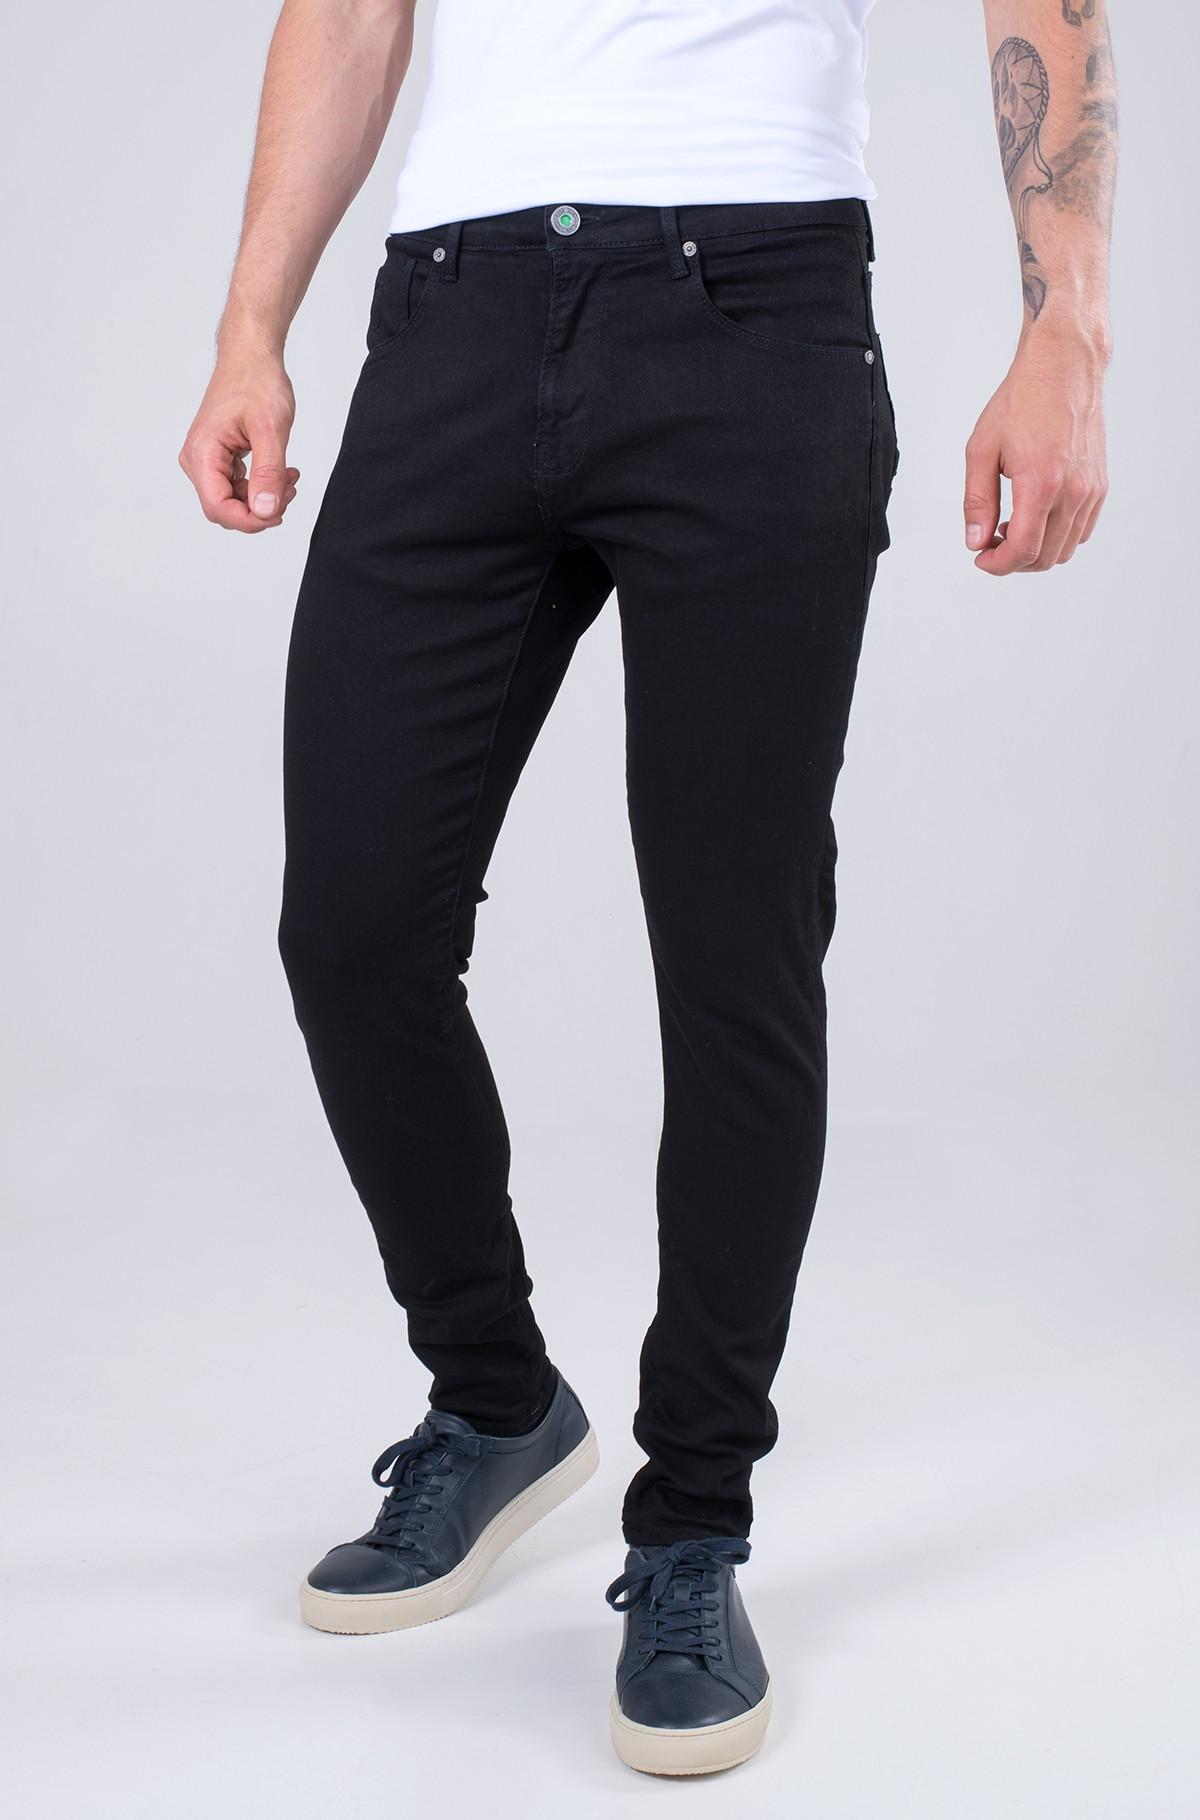 Jeans MORIARTY LAK 383-full-1